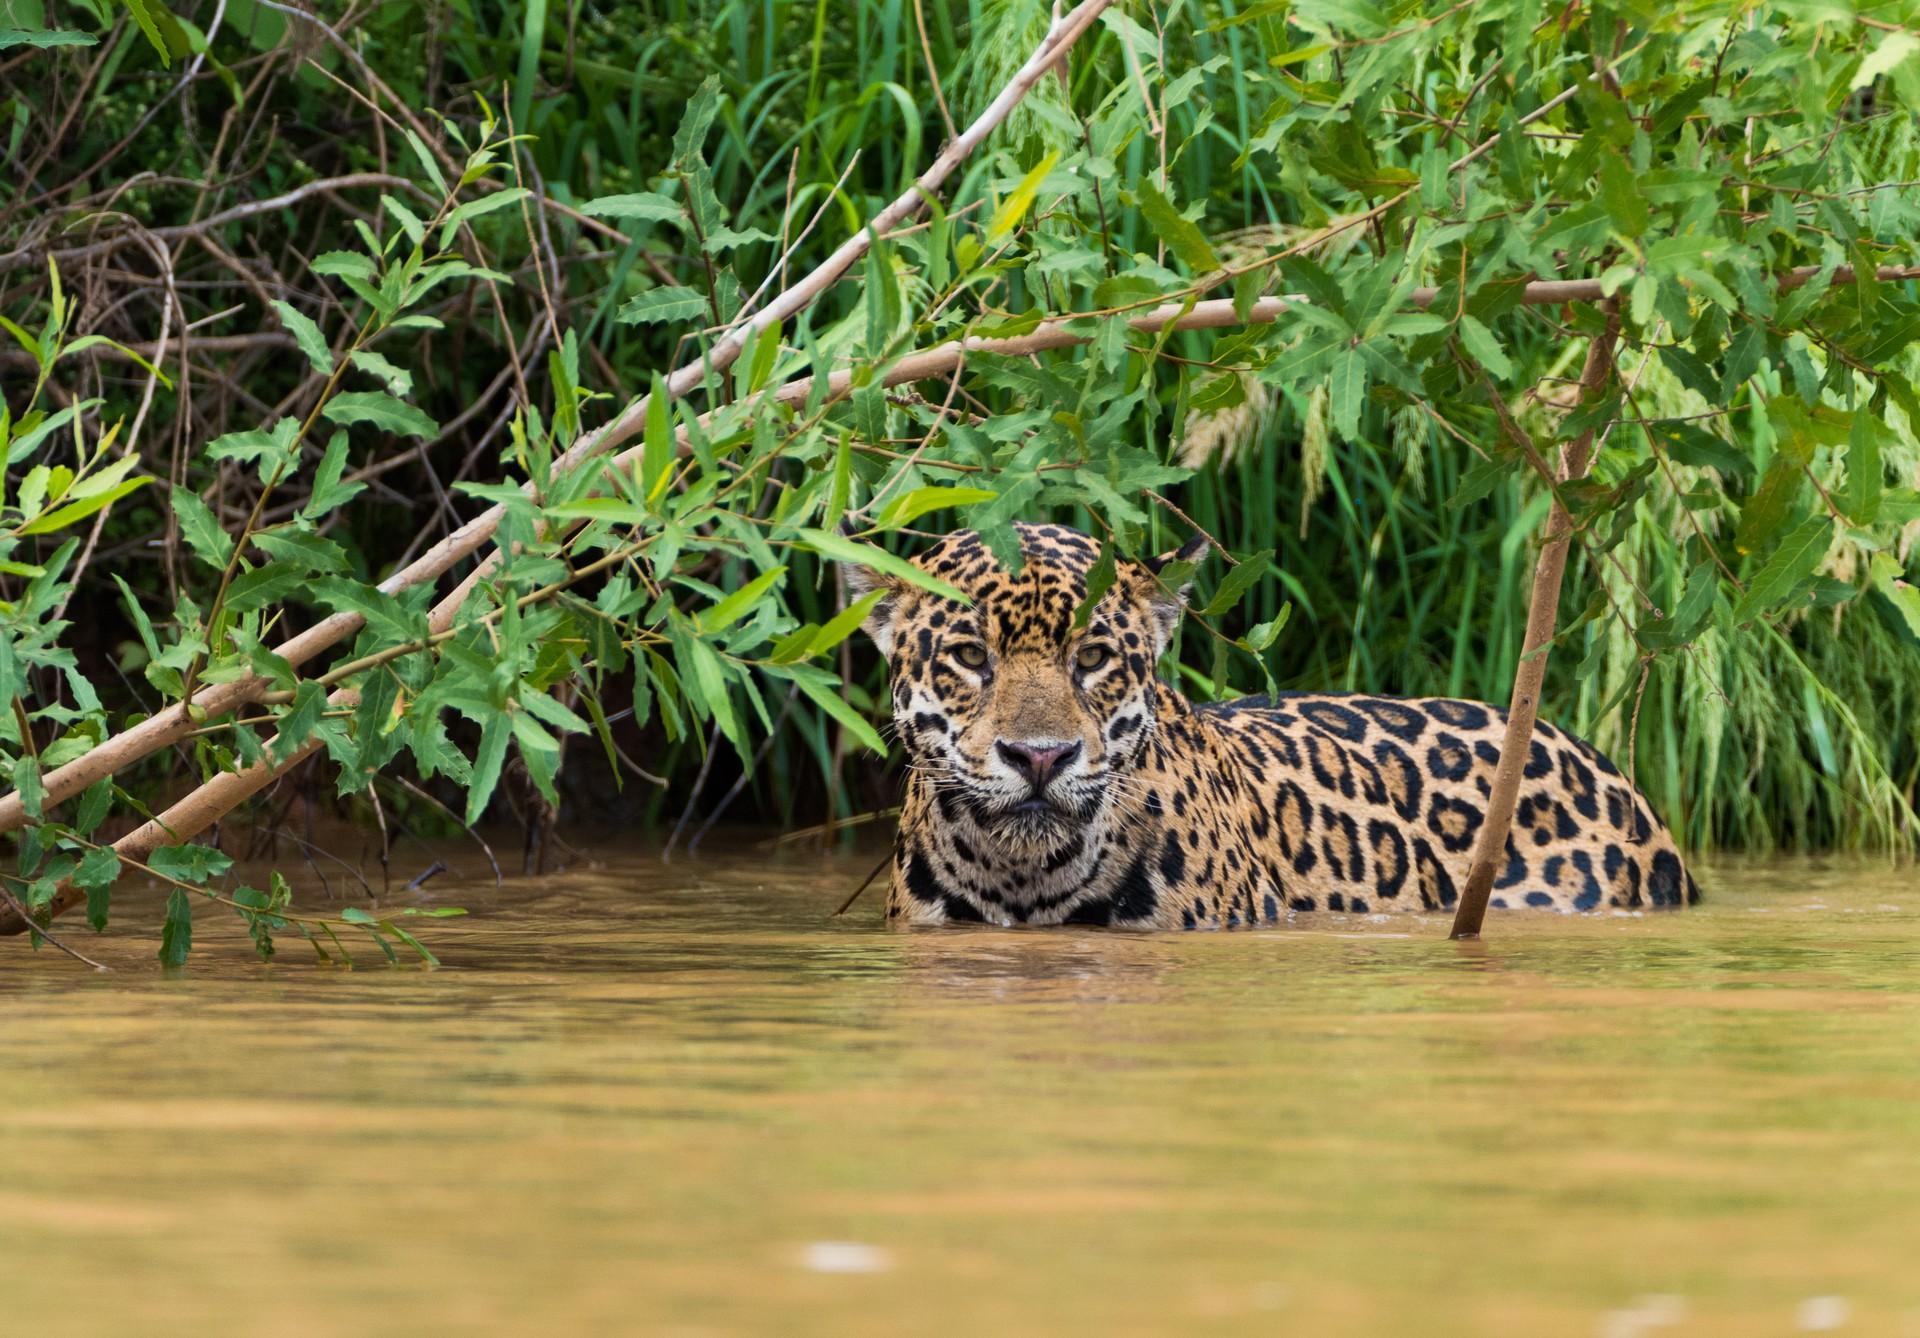 Ulitmate holiday destinations: Jaguar  in Pantanal National Park